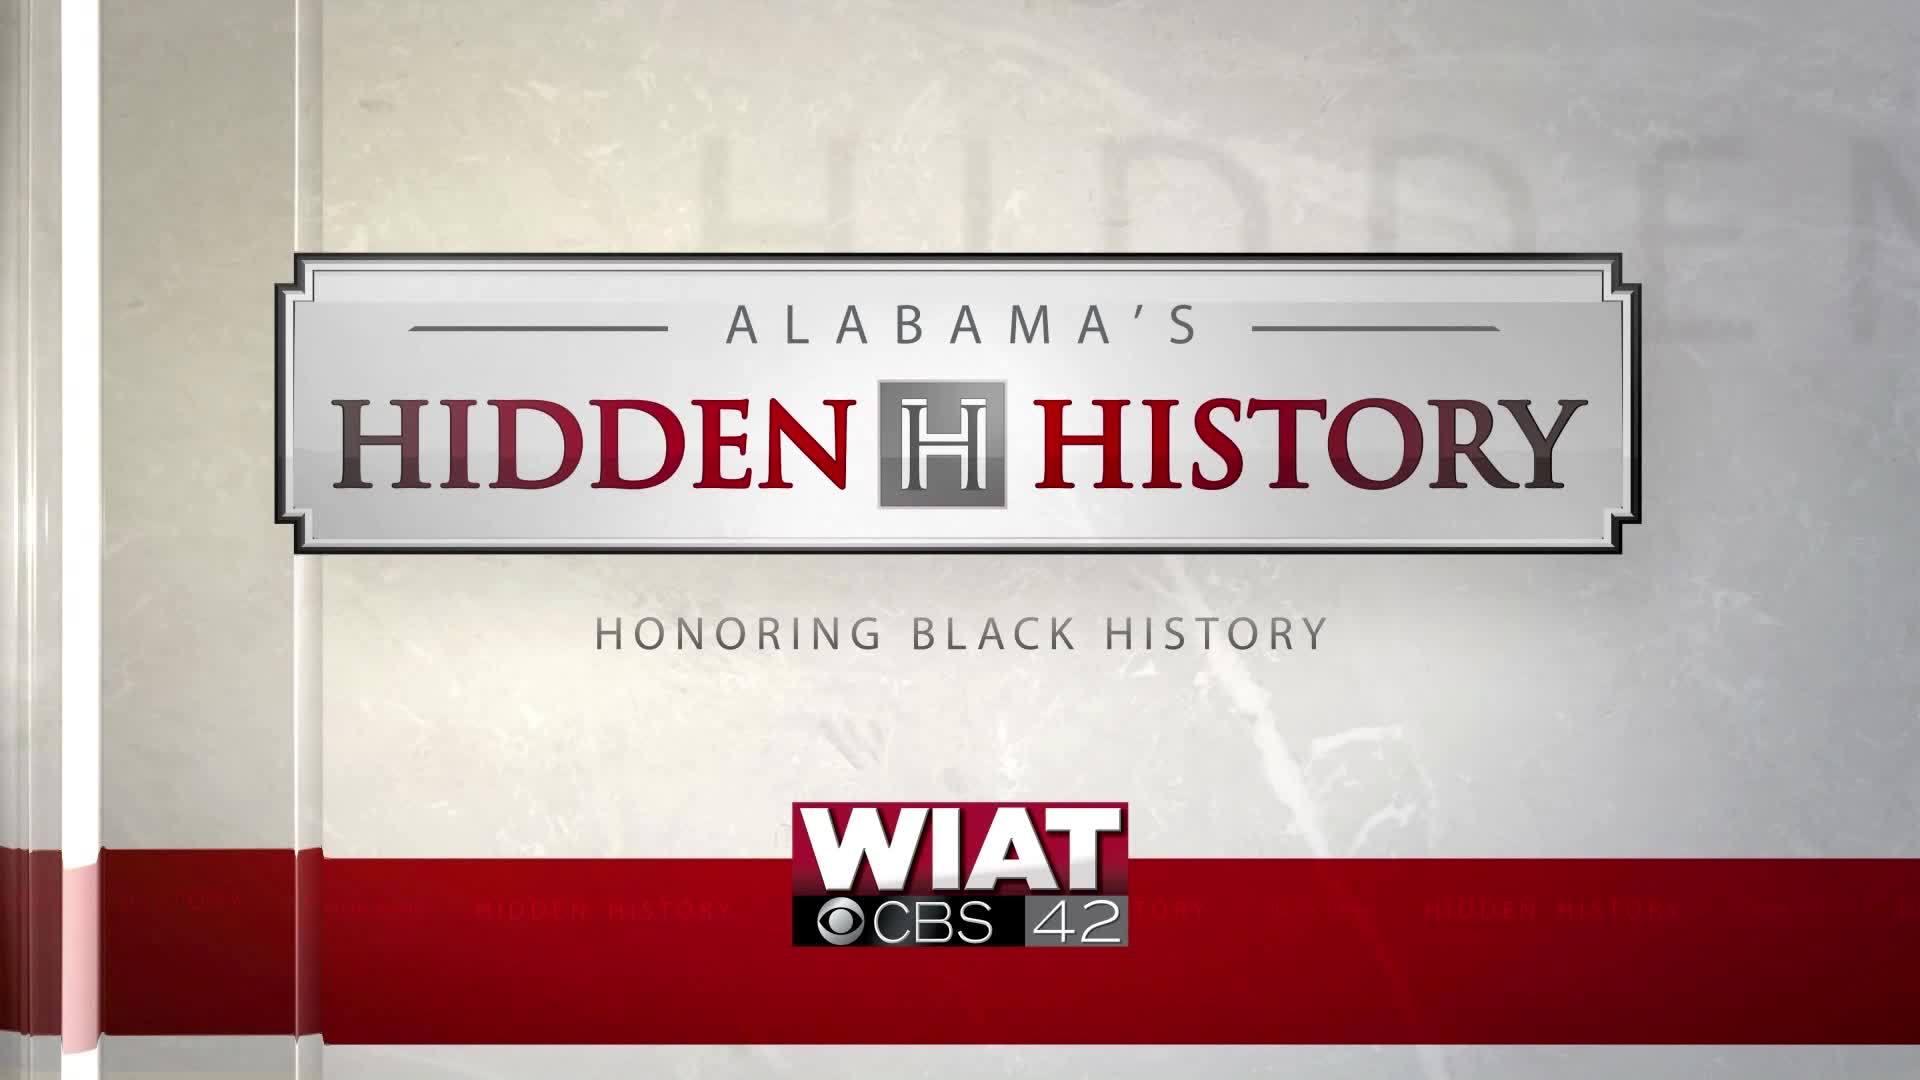 Alabama's Hidden History